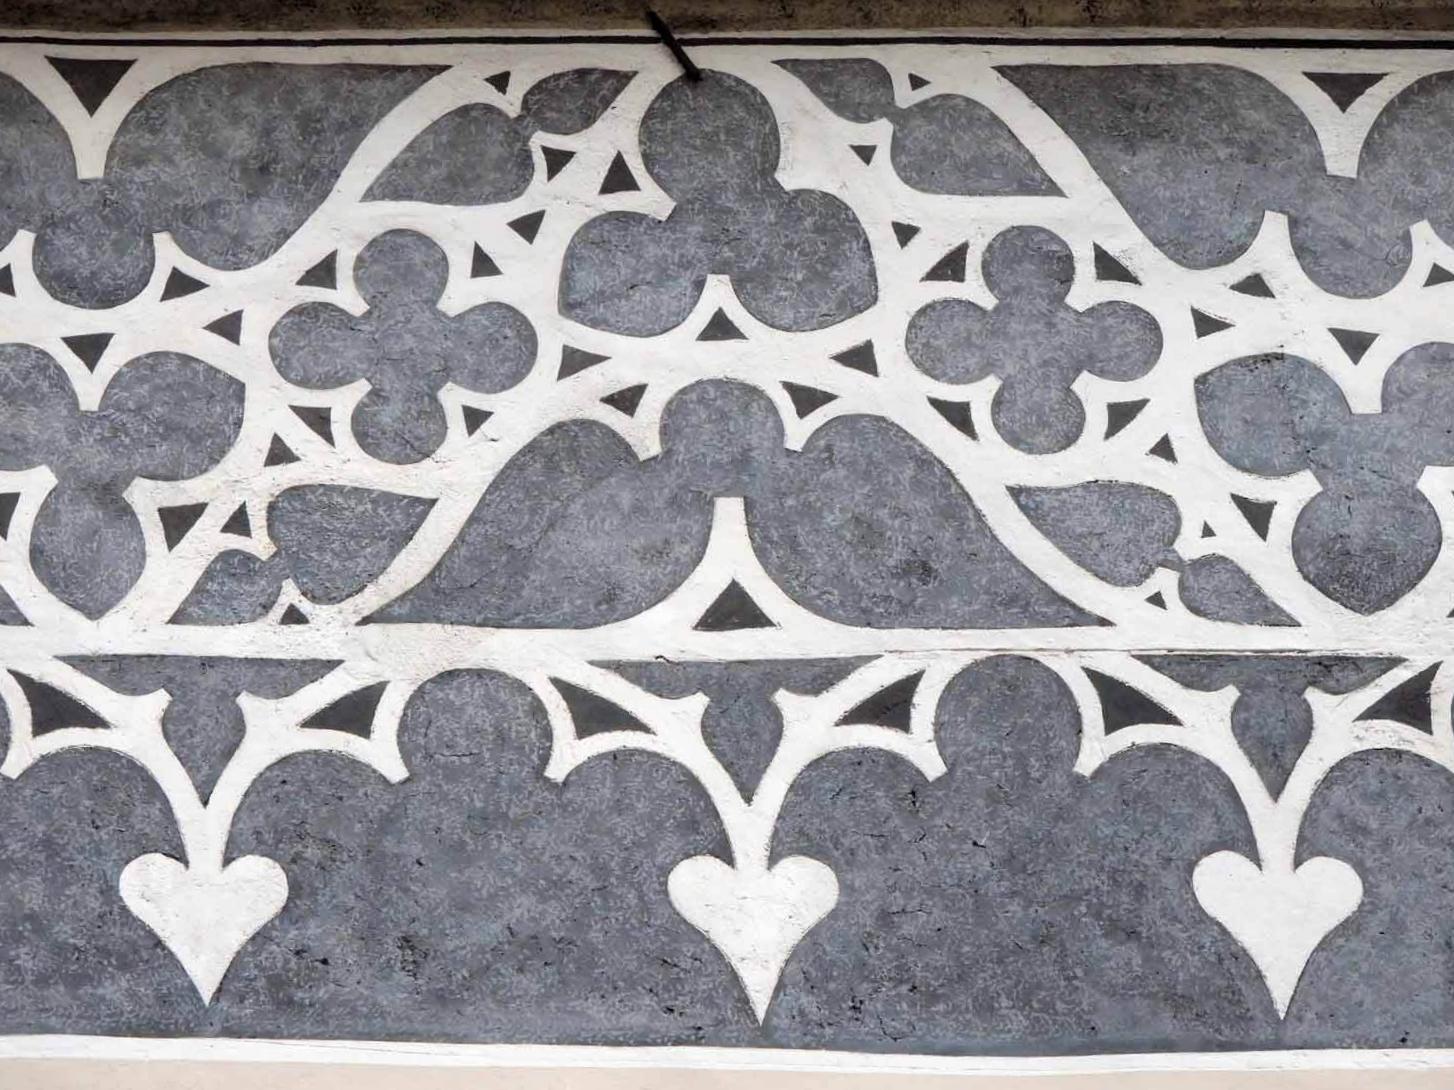 austria-imst-church-design-art.JPG